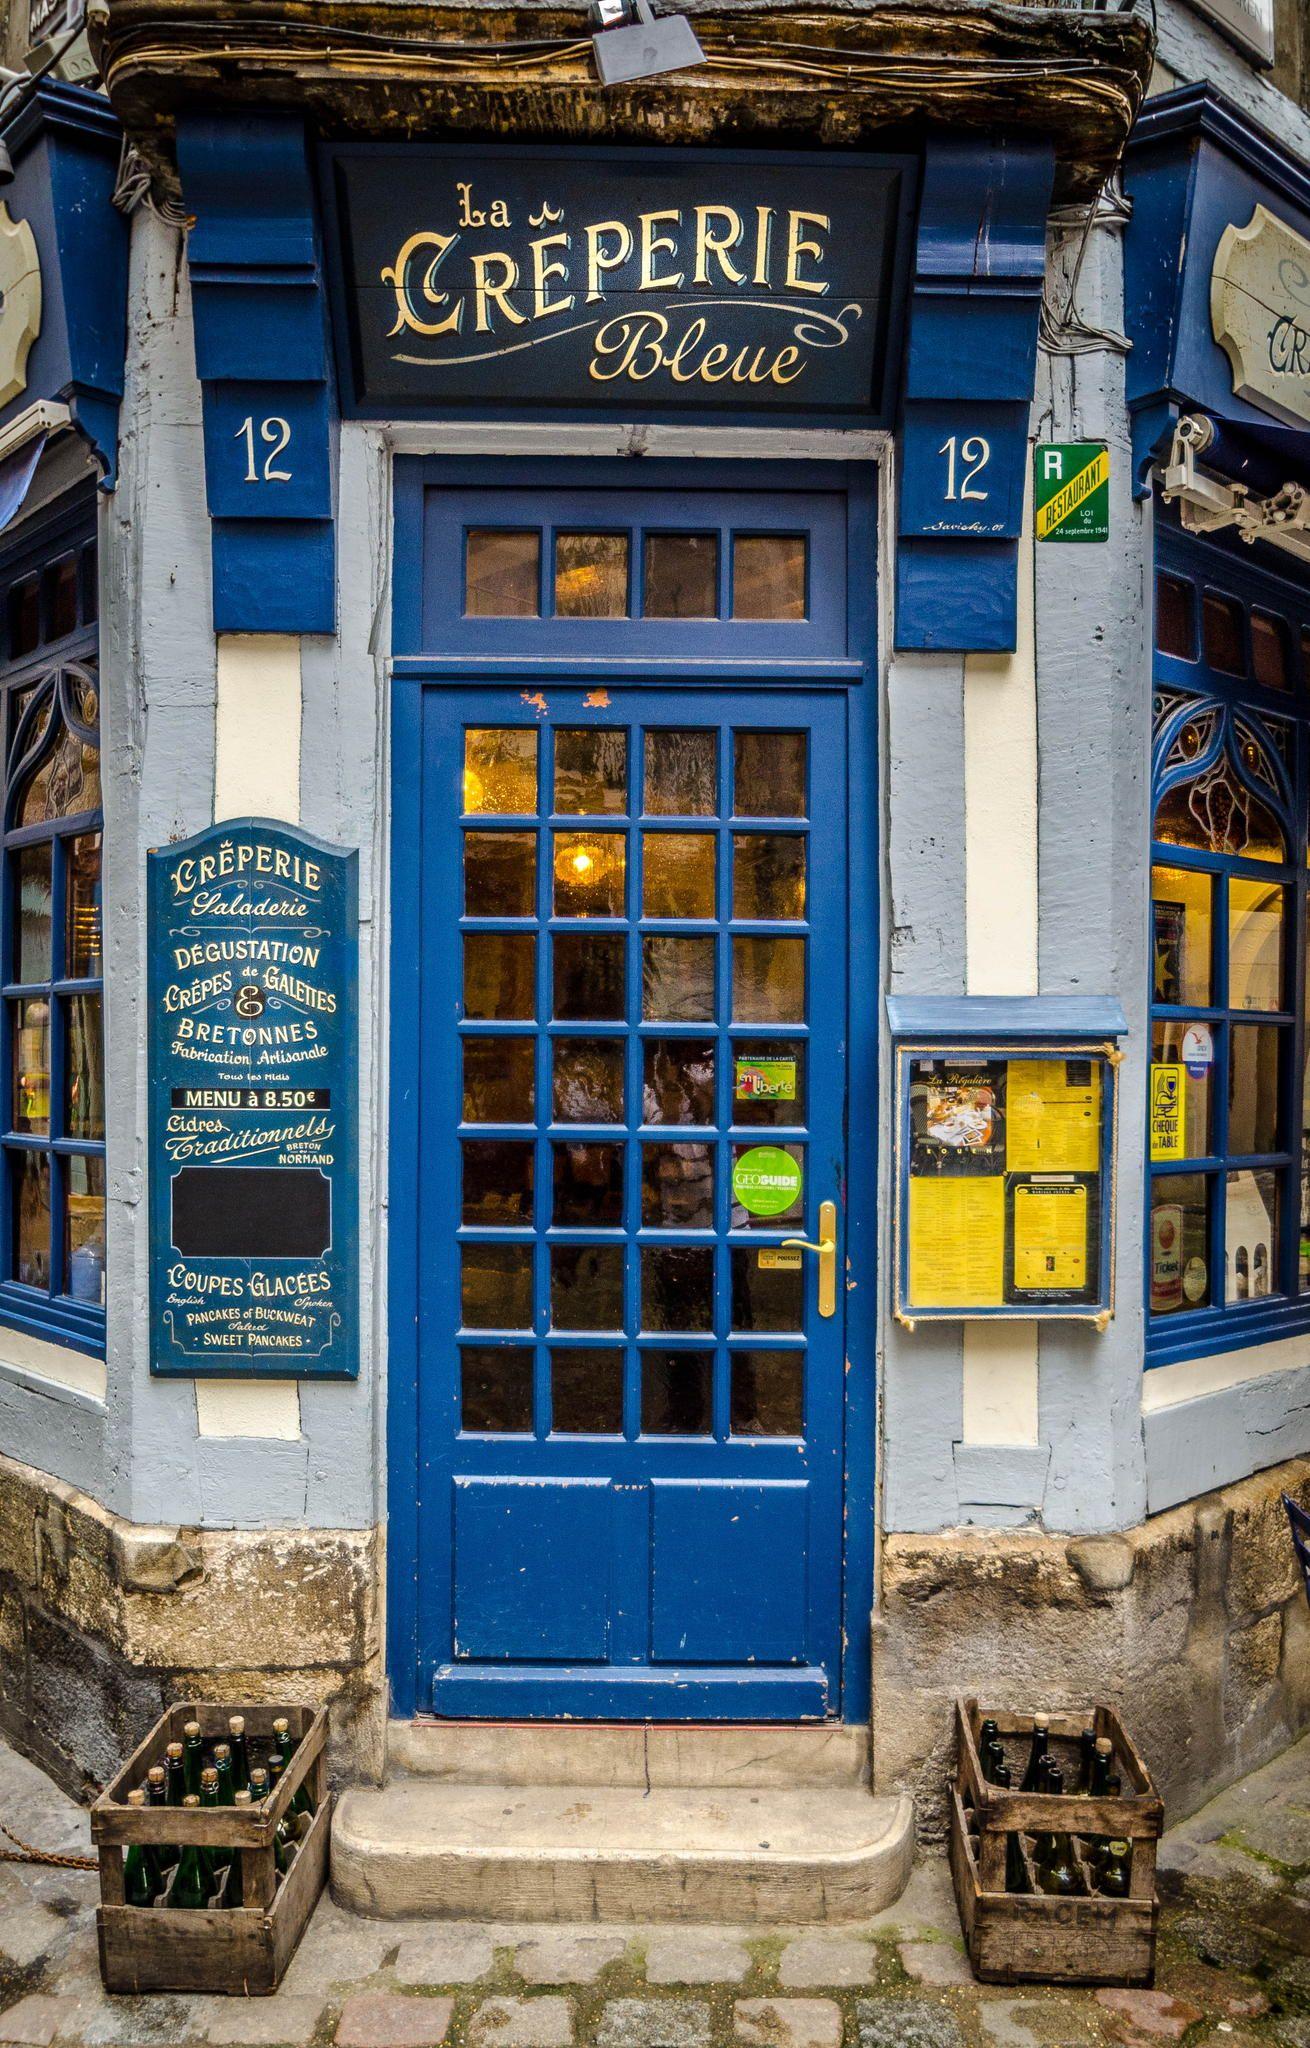 La Creperie Bleue in Rouen, Haute-Normandie, France by Richard Depinay